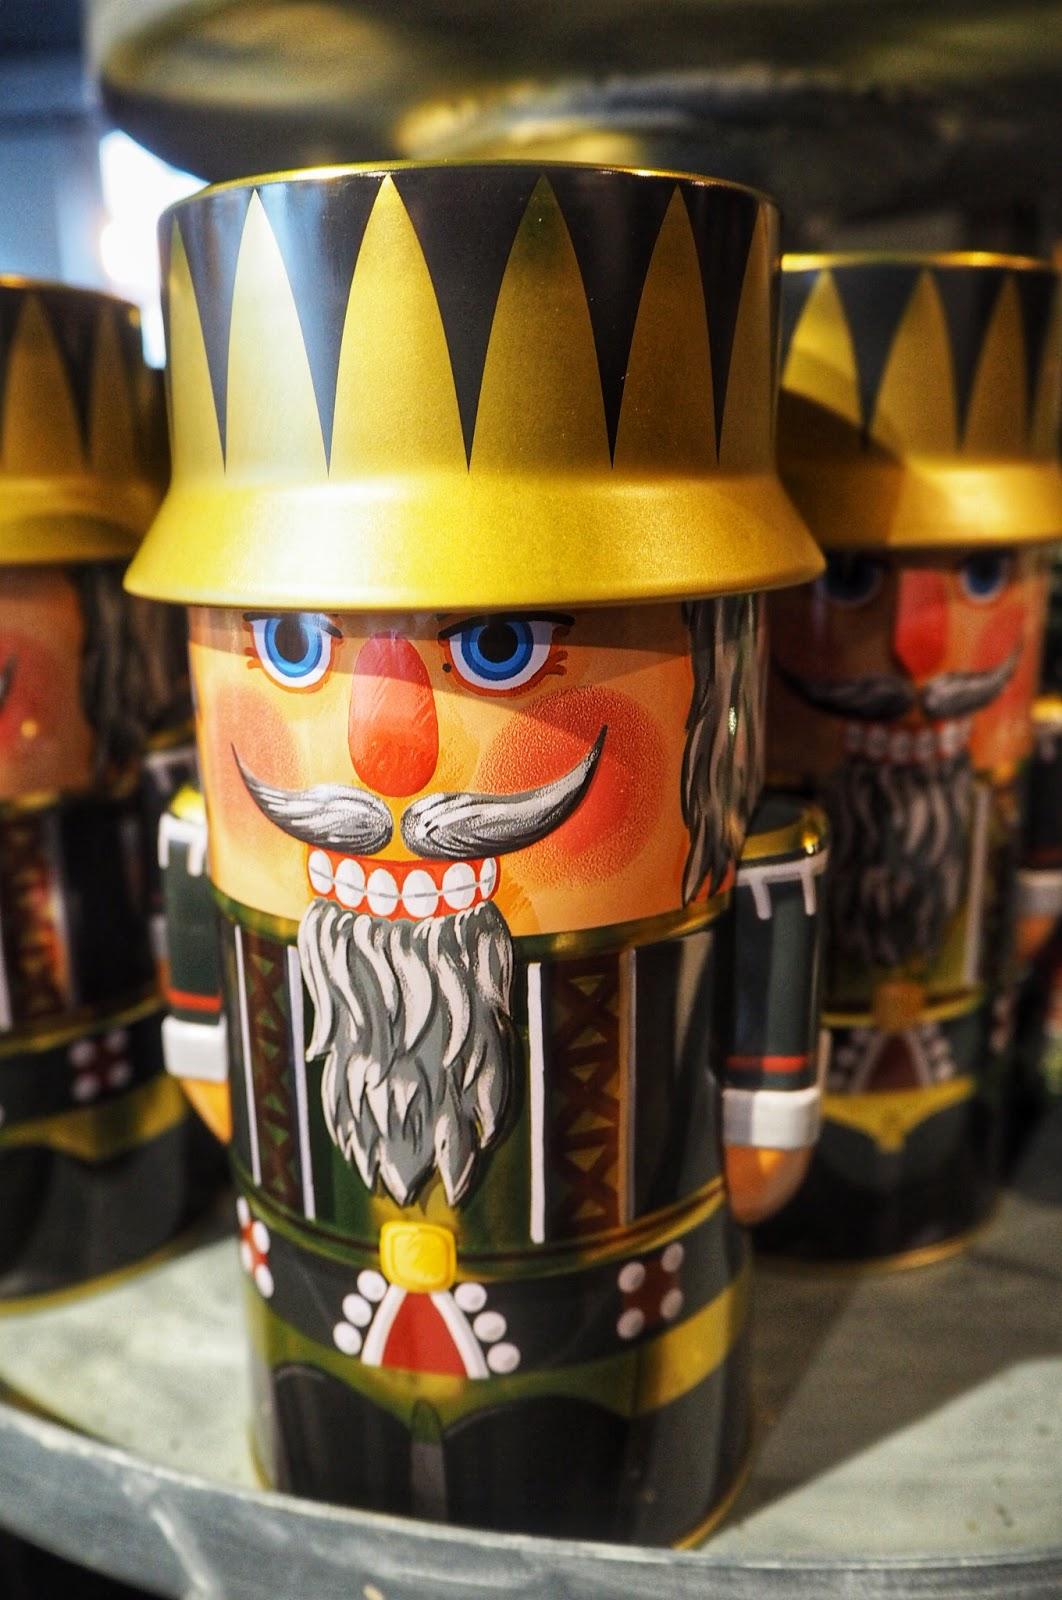 Tin soldier Christmas gift in Robbies Den Bosch